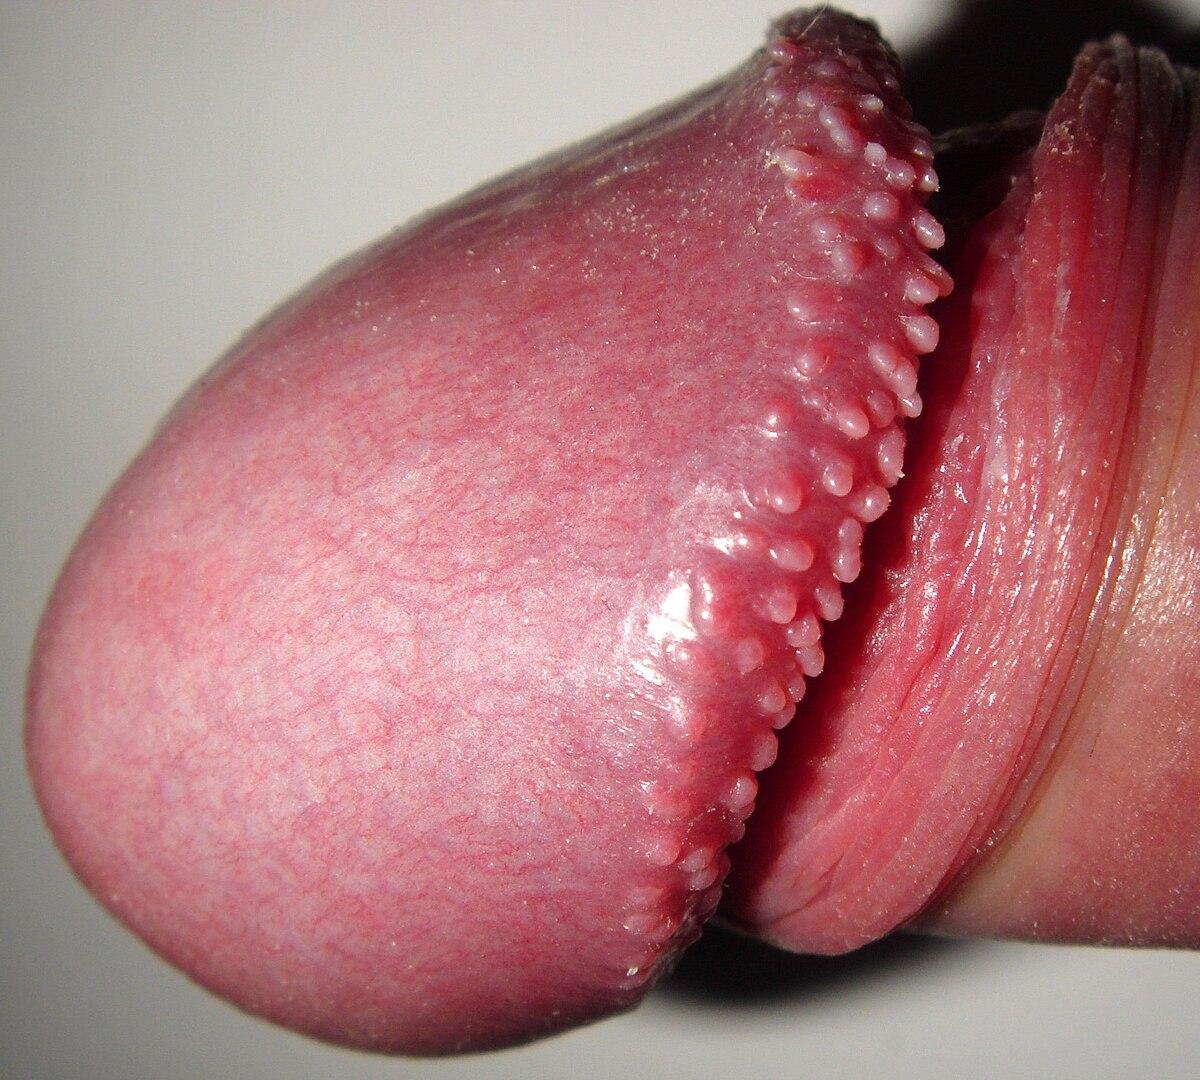 papillomatosis adalah can having hpv cause cancer